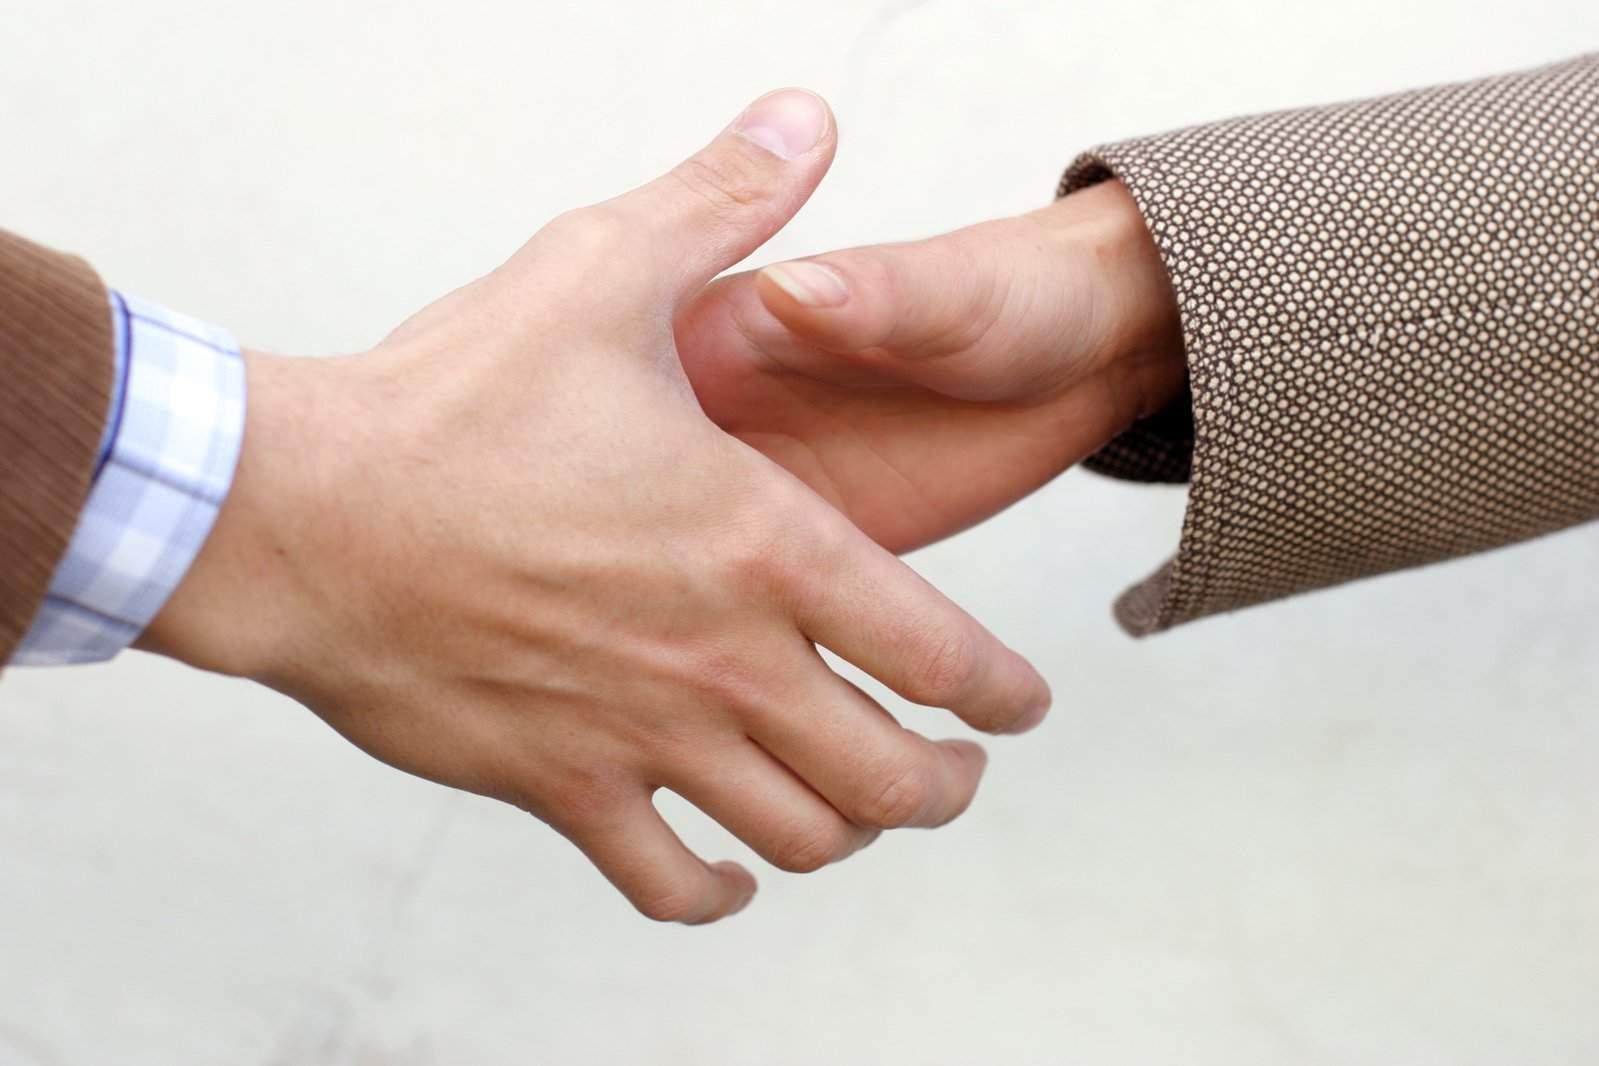 handshake-detail-october